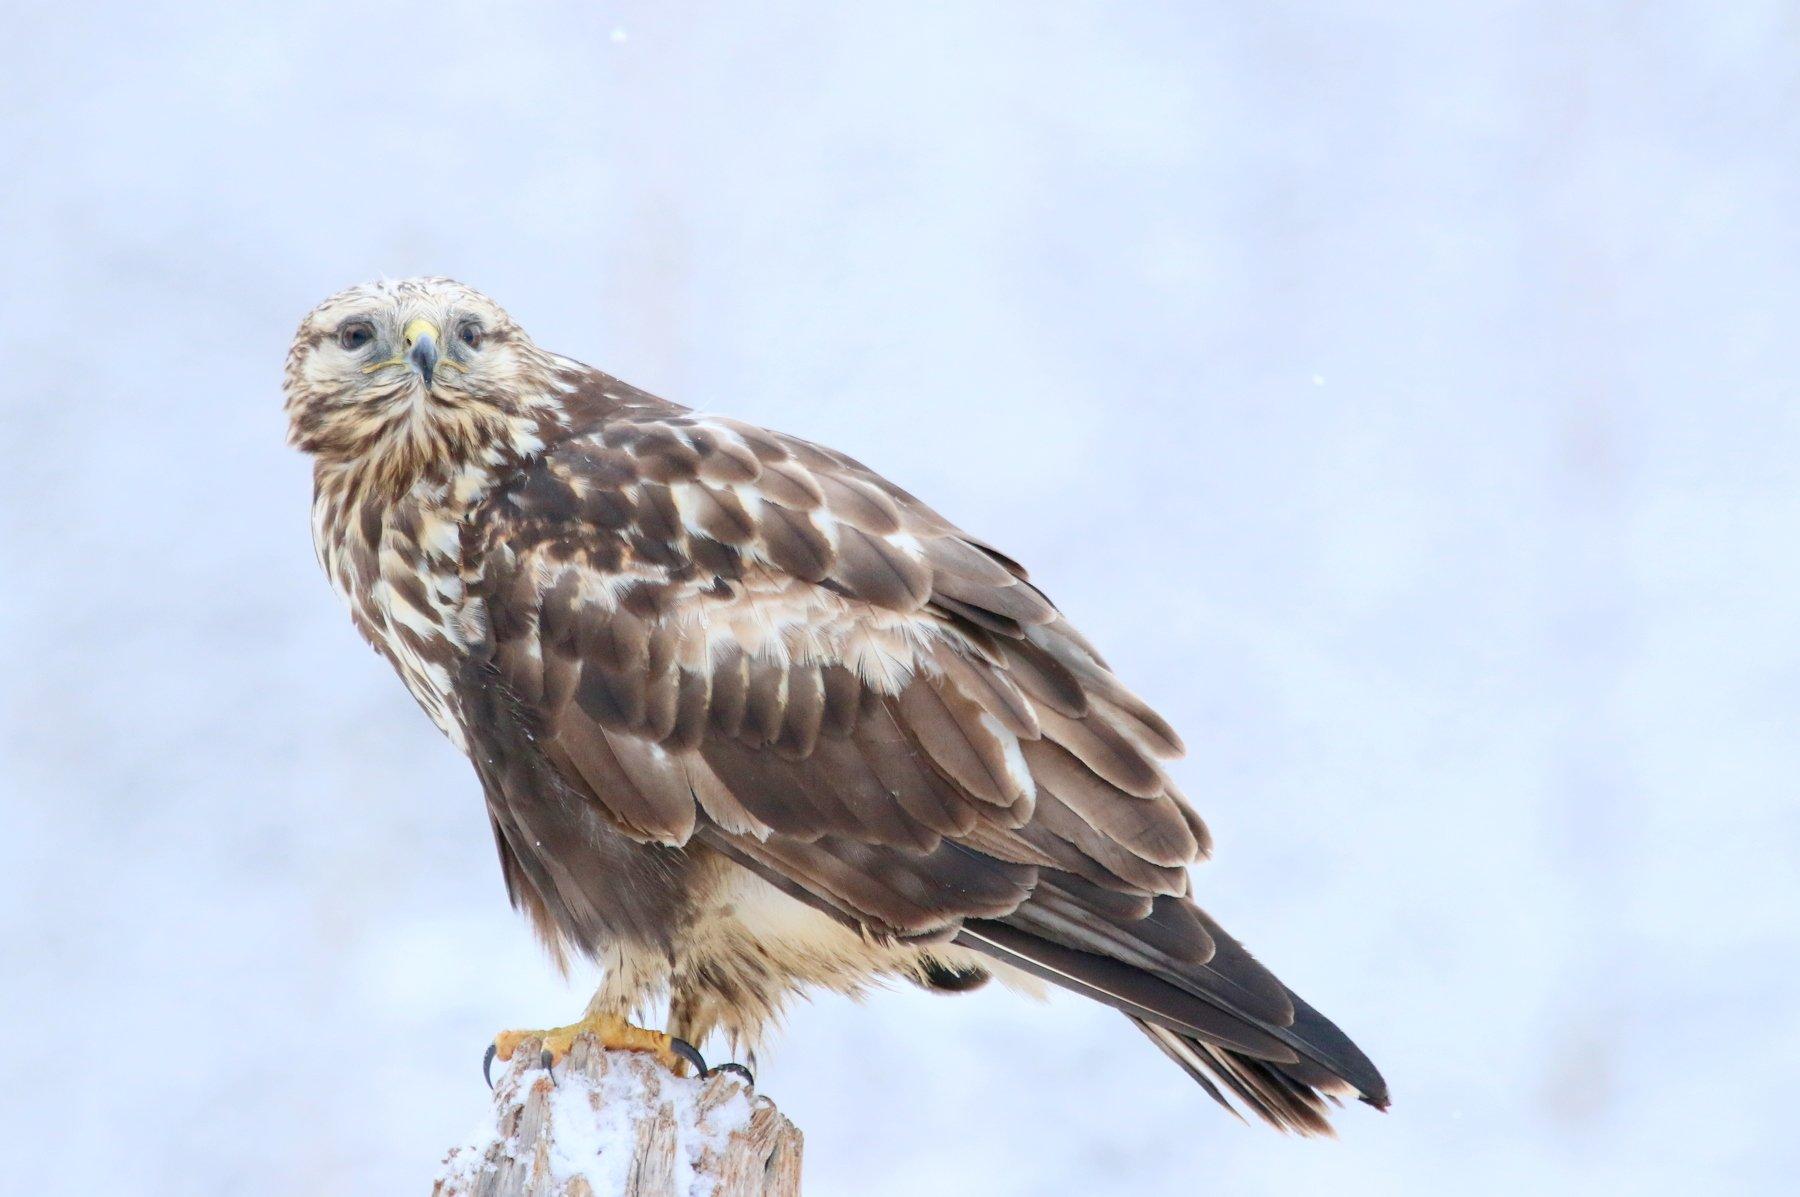 buteo lagopus, rough-legged buzzard, buzzard, nature, bird, bird of prey, forest, woods, winter, Evaldas Vaitkus